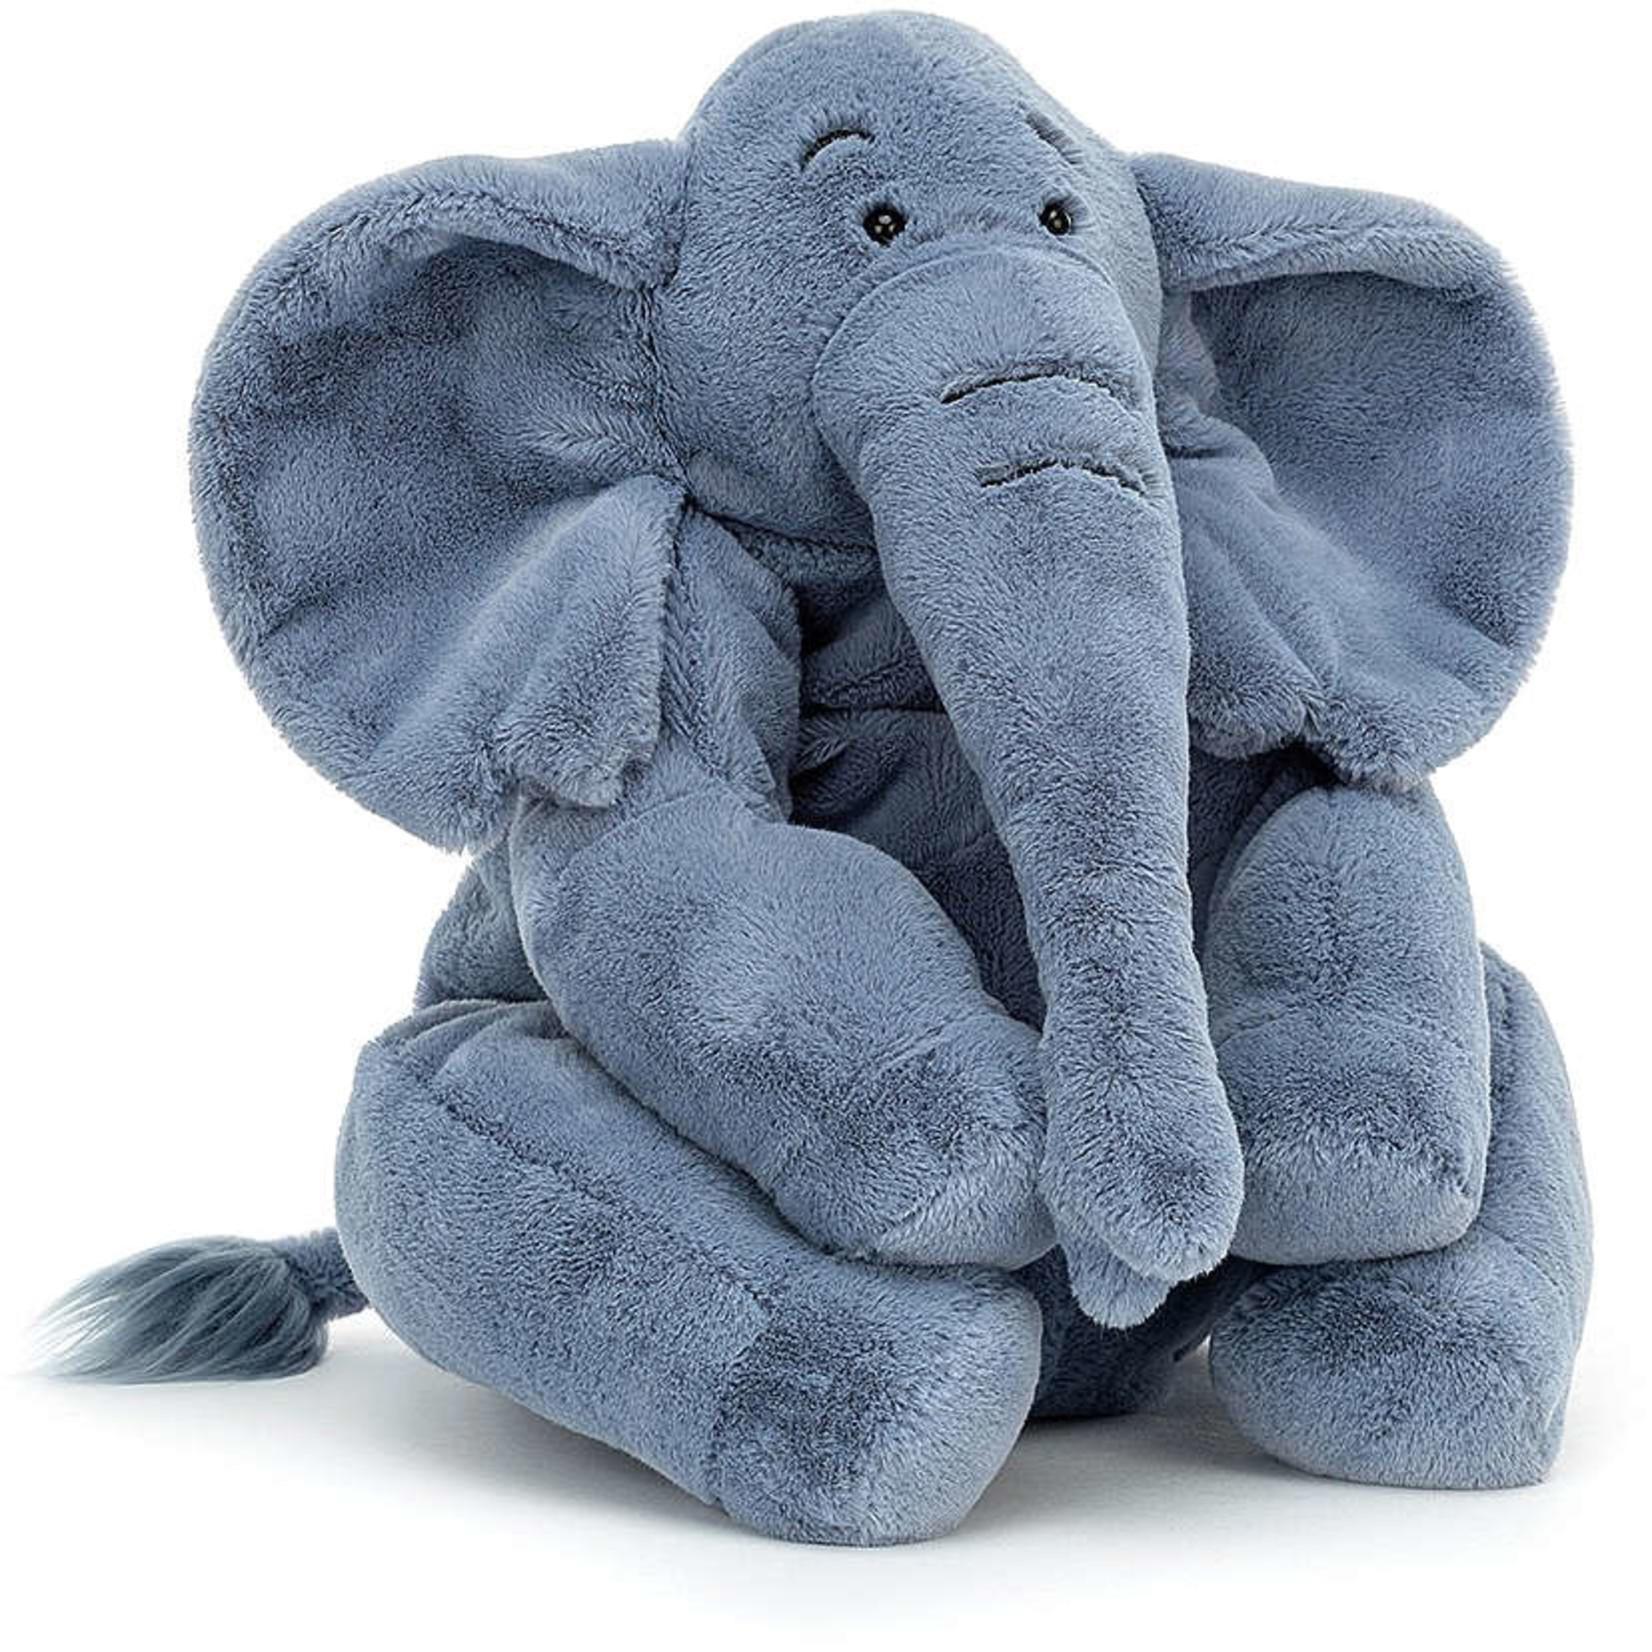 JELLYCAT RUMPLETUM ELEPHANT